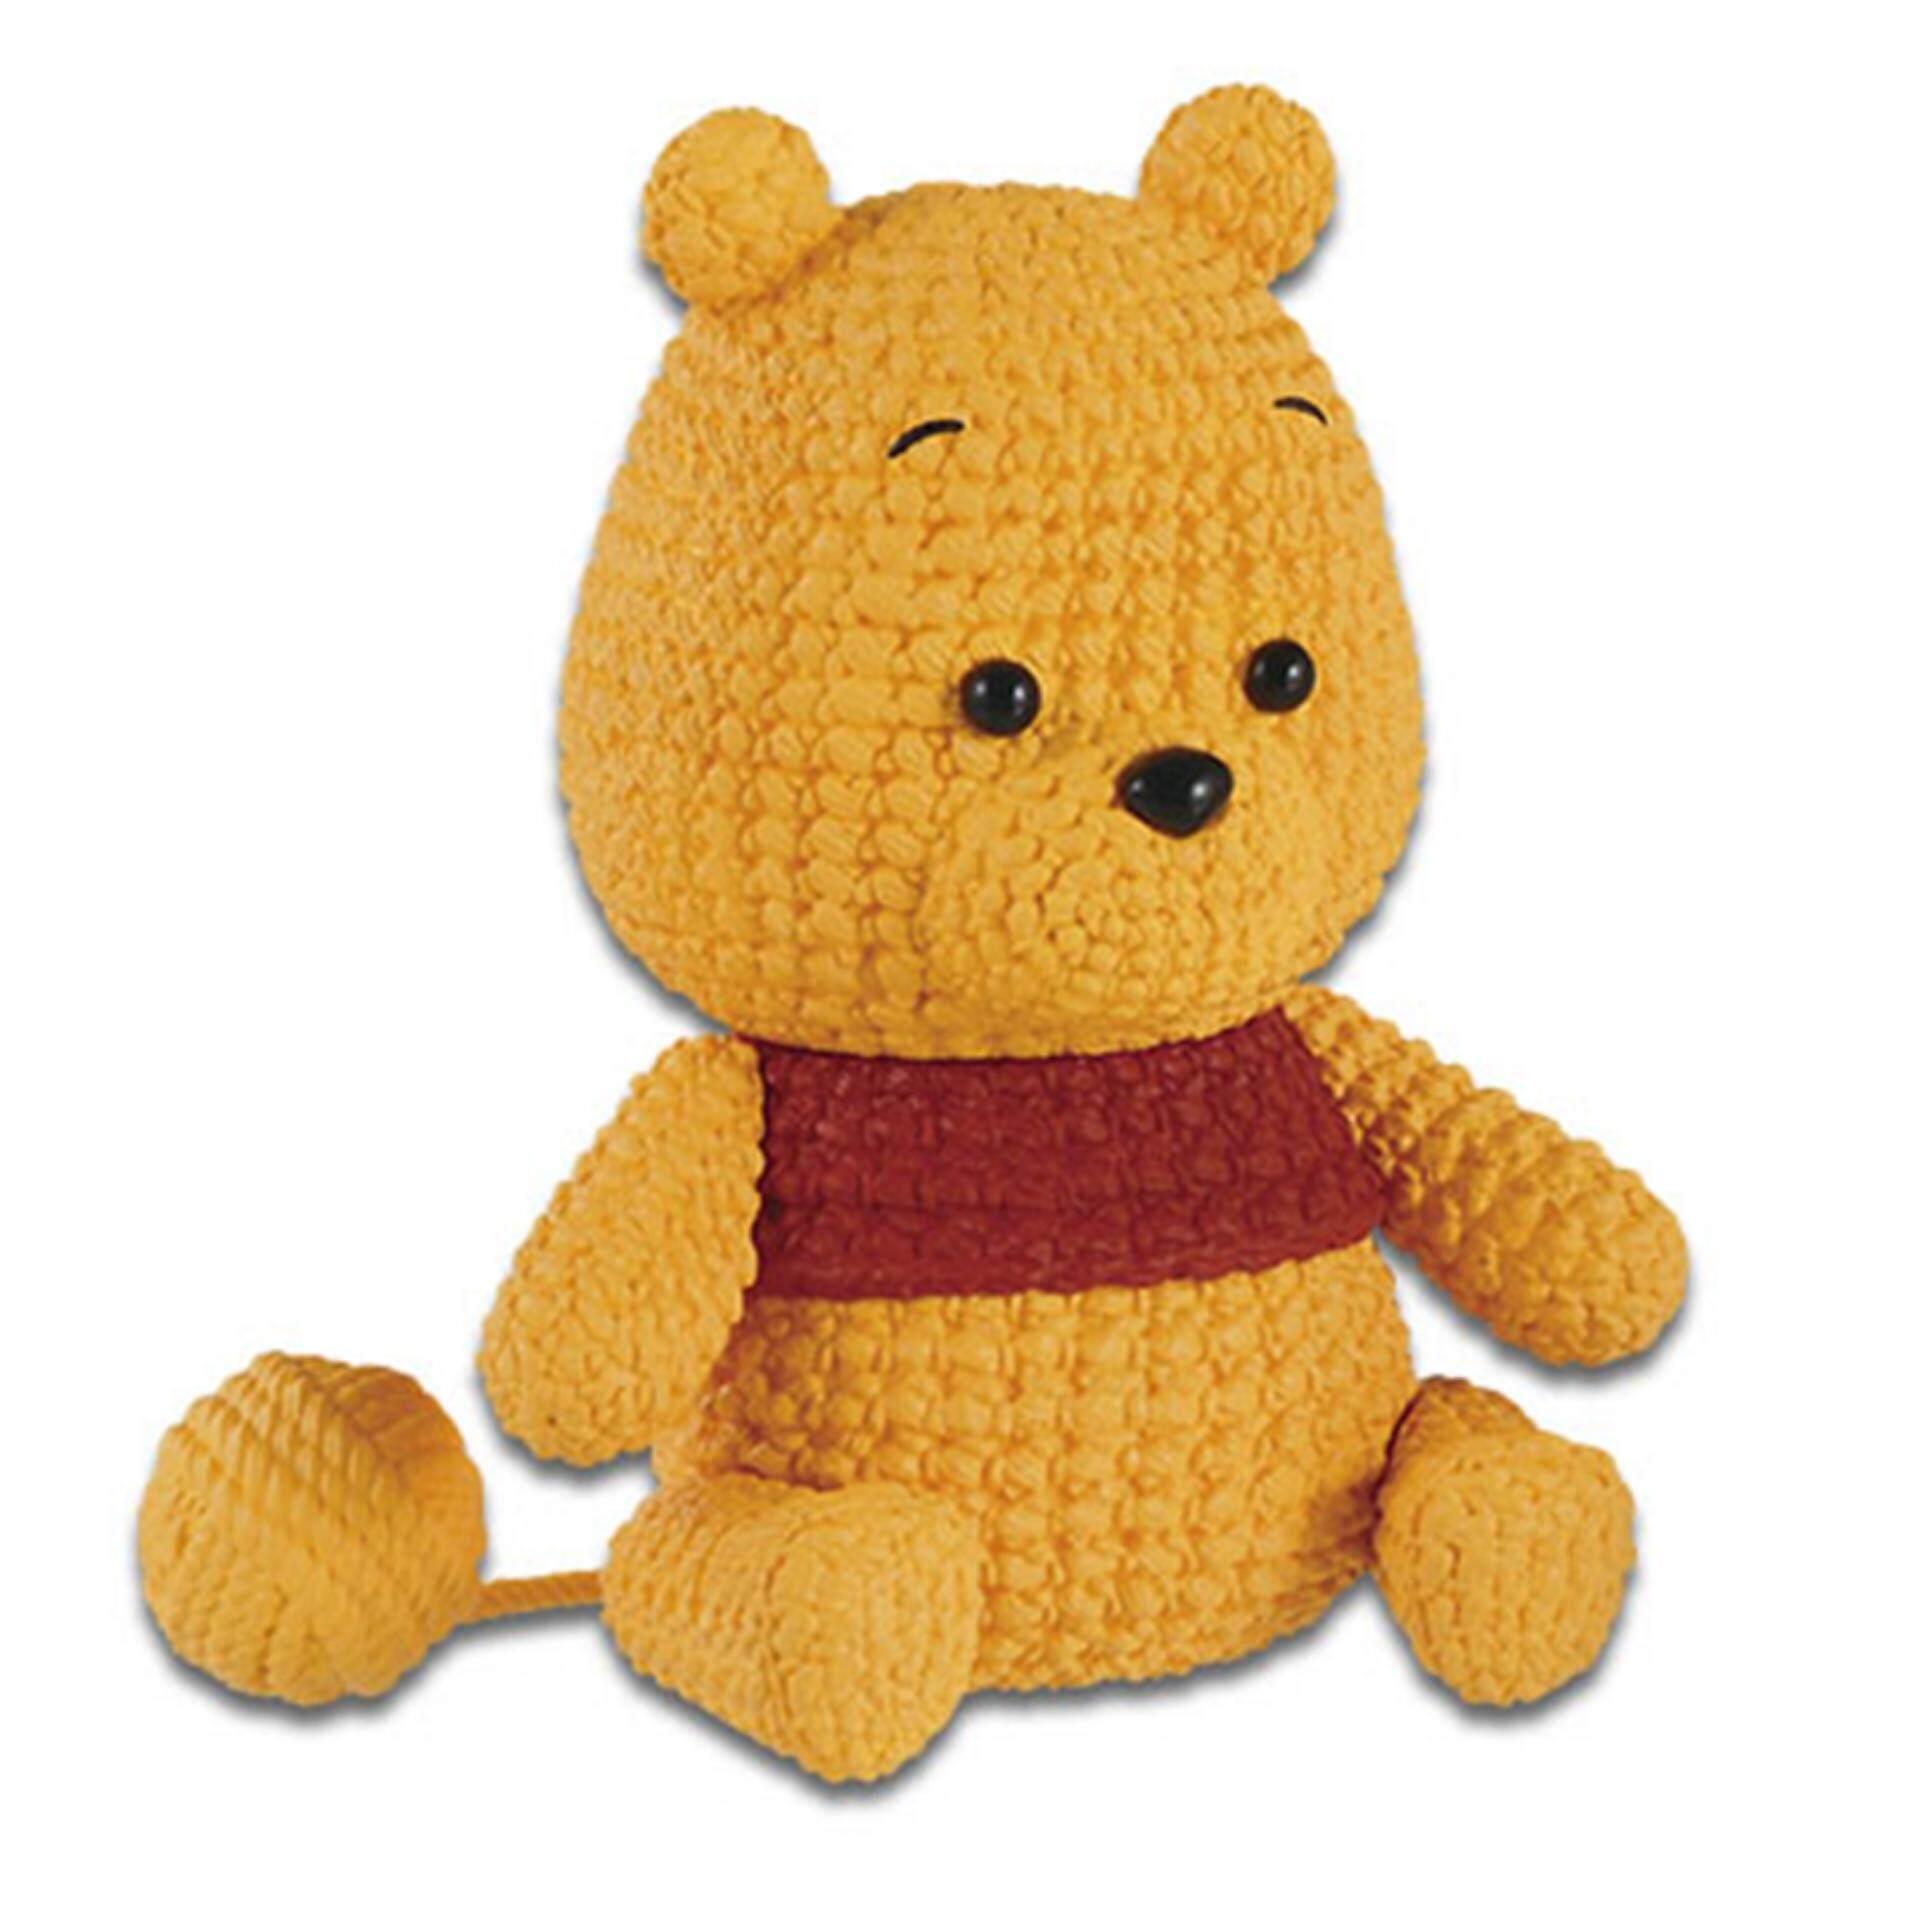 Banpresto Amimcot Disney Winnie The Pooh Figure - Dark Colour Toys for boys